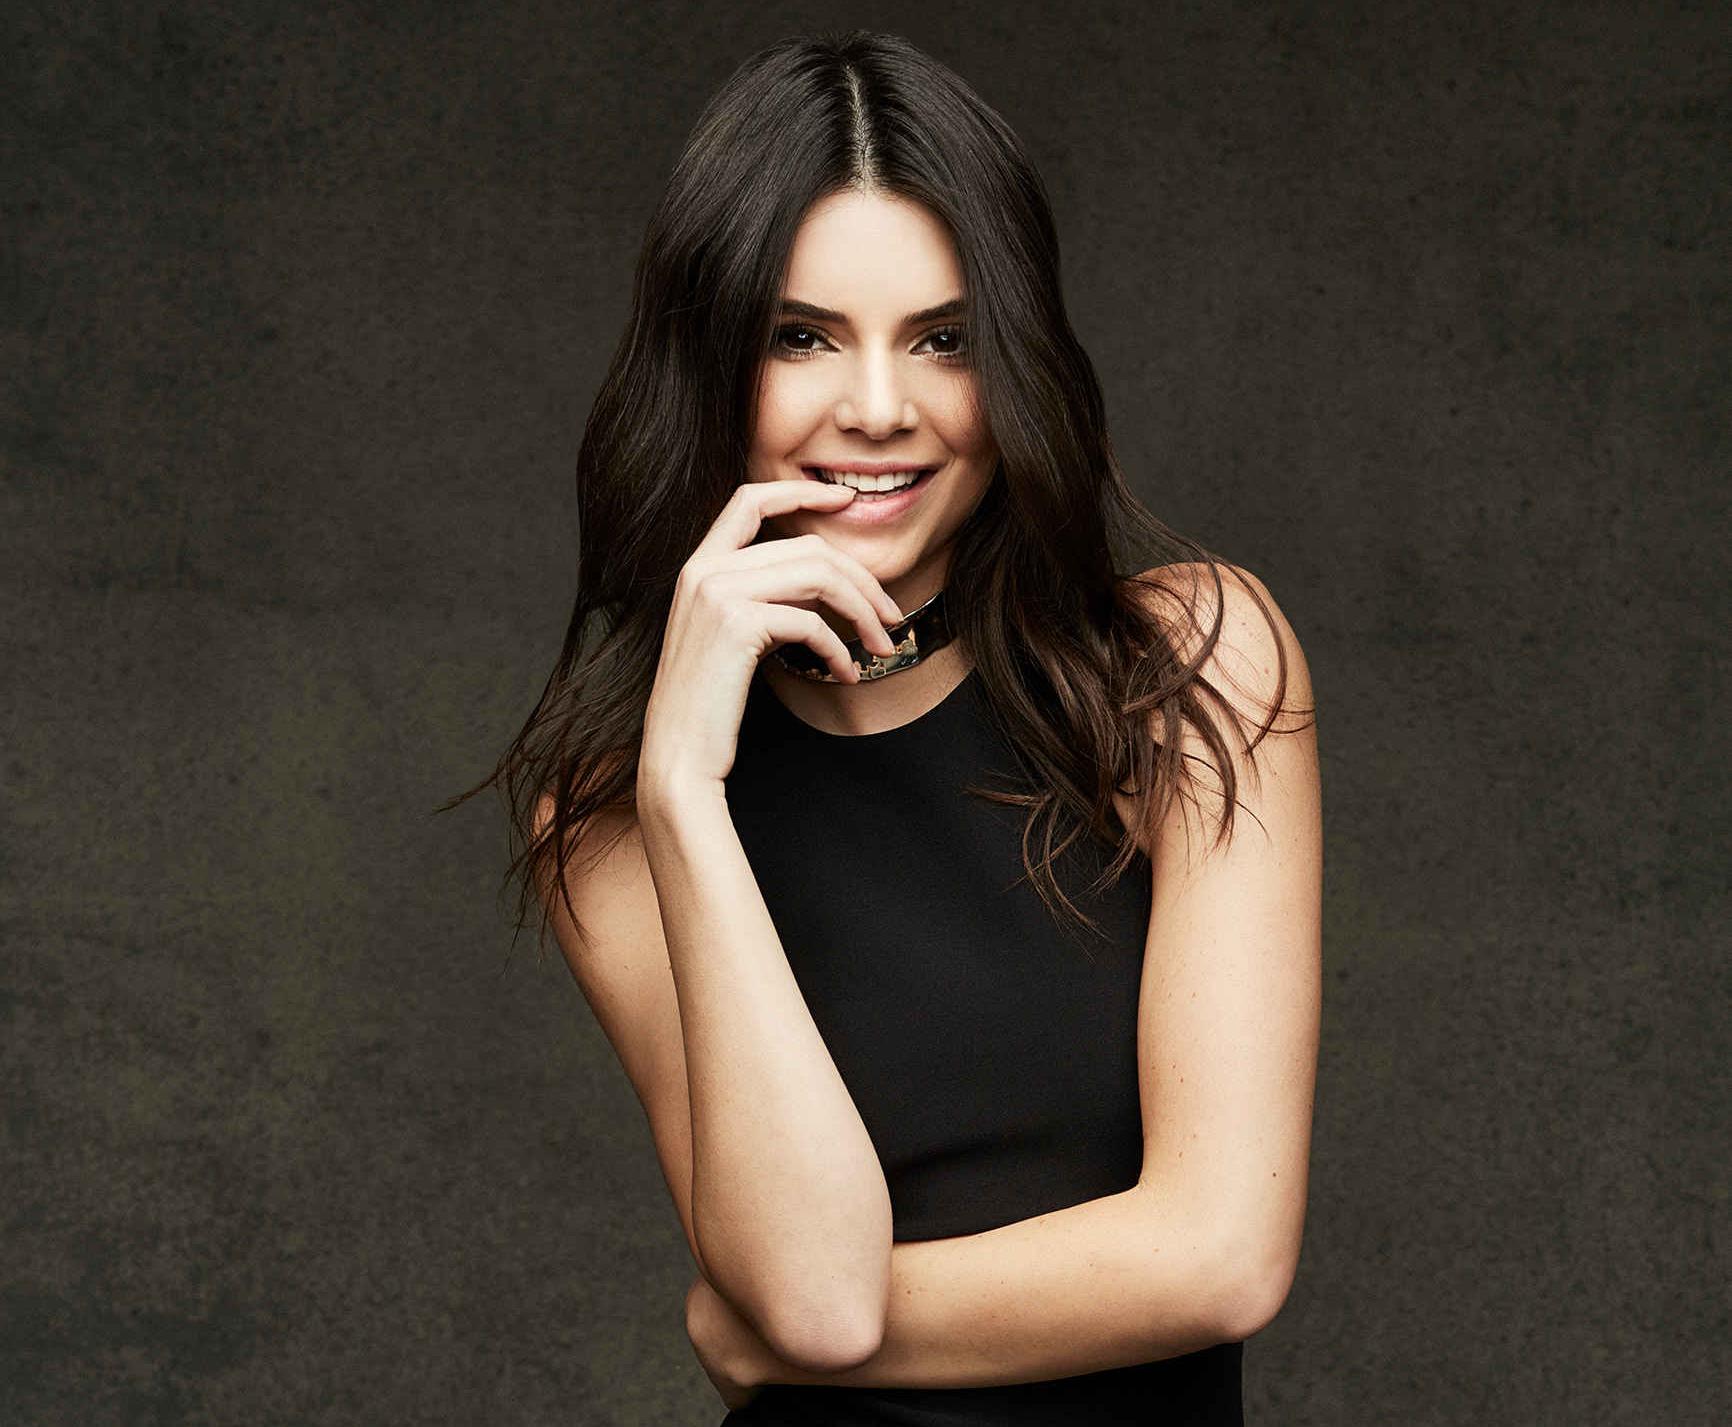 Kylie Jenner Wallpapers: Kendall Jenner Celebrity, HD Celebrities, 4k Wallpapers